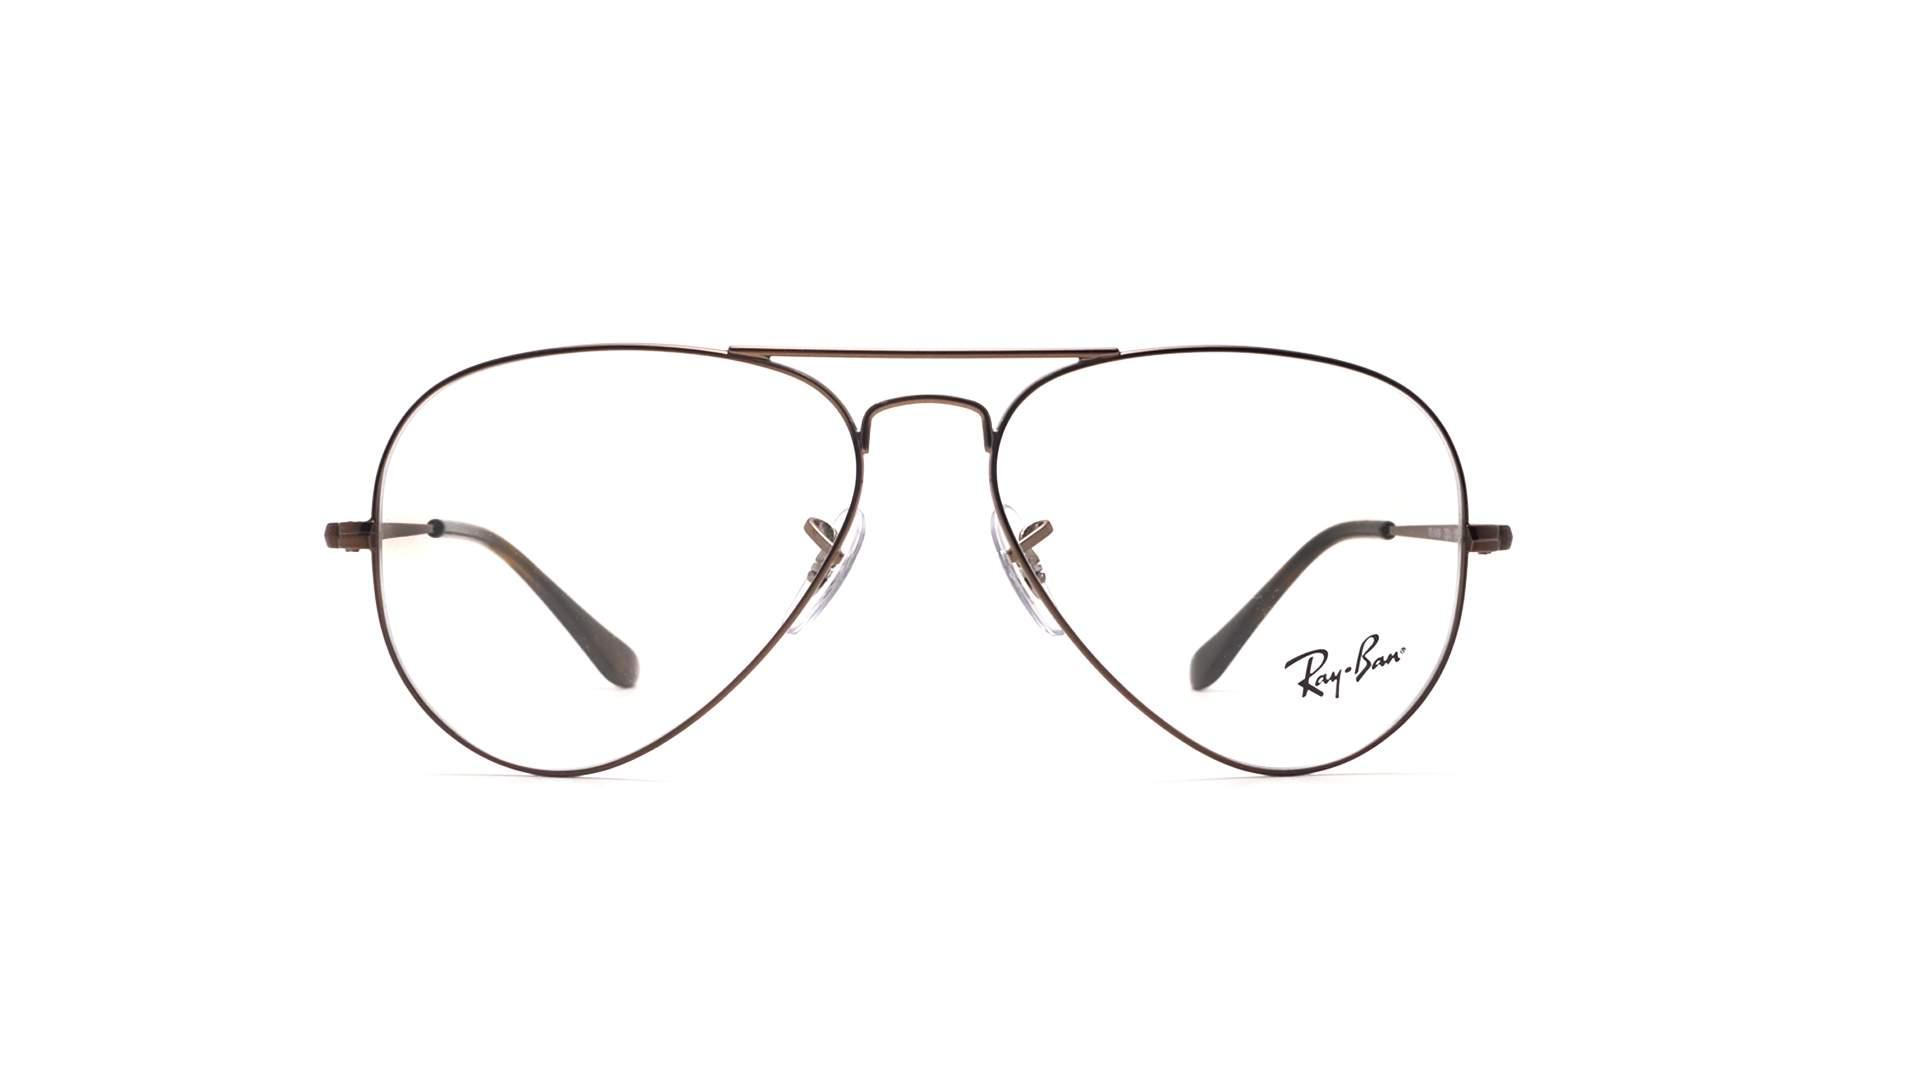 e5a55a0de3 Eyeglasses Ray-Ban Aviator Optics Brown RX6489 RB6489 2531 55-14 Medium